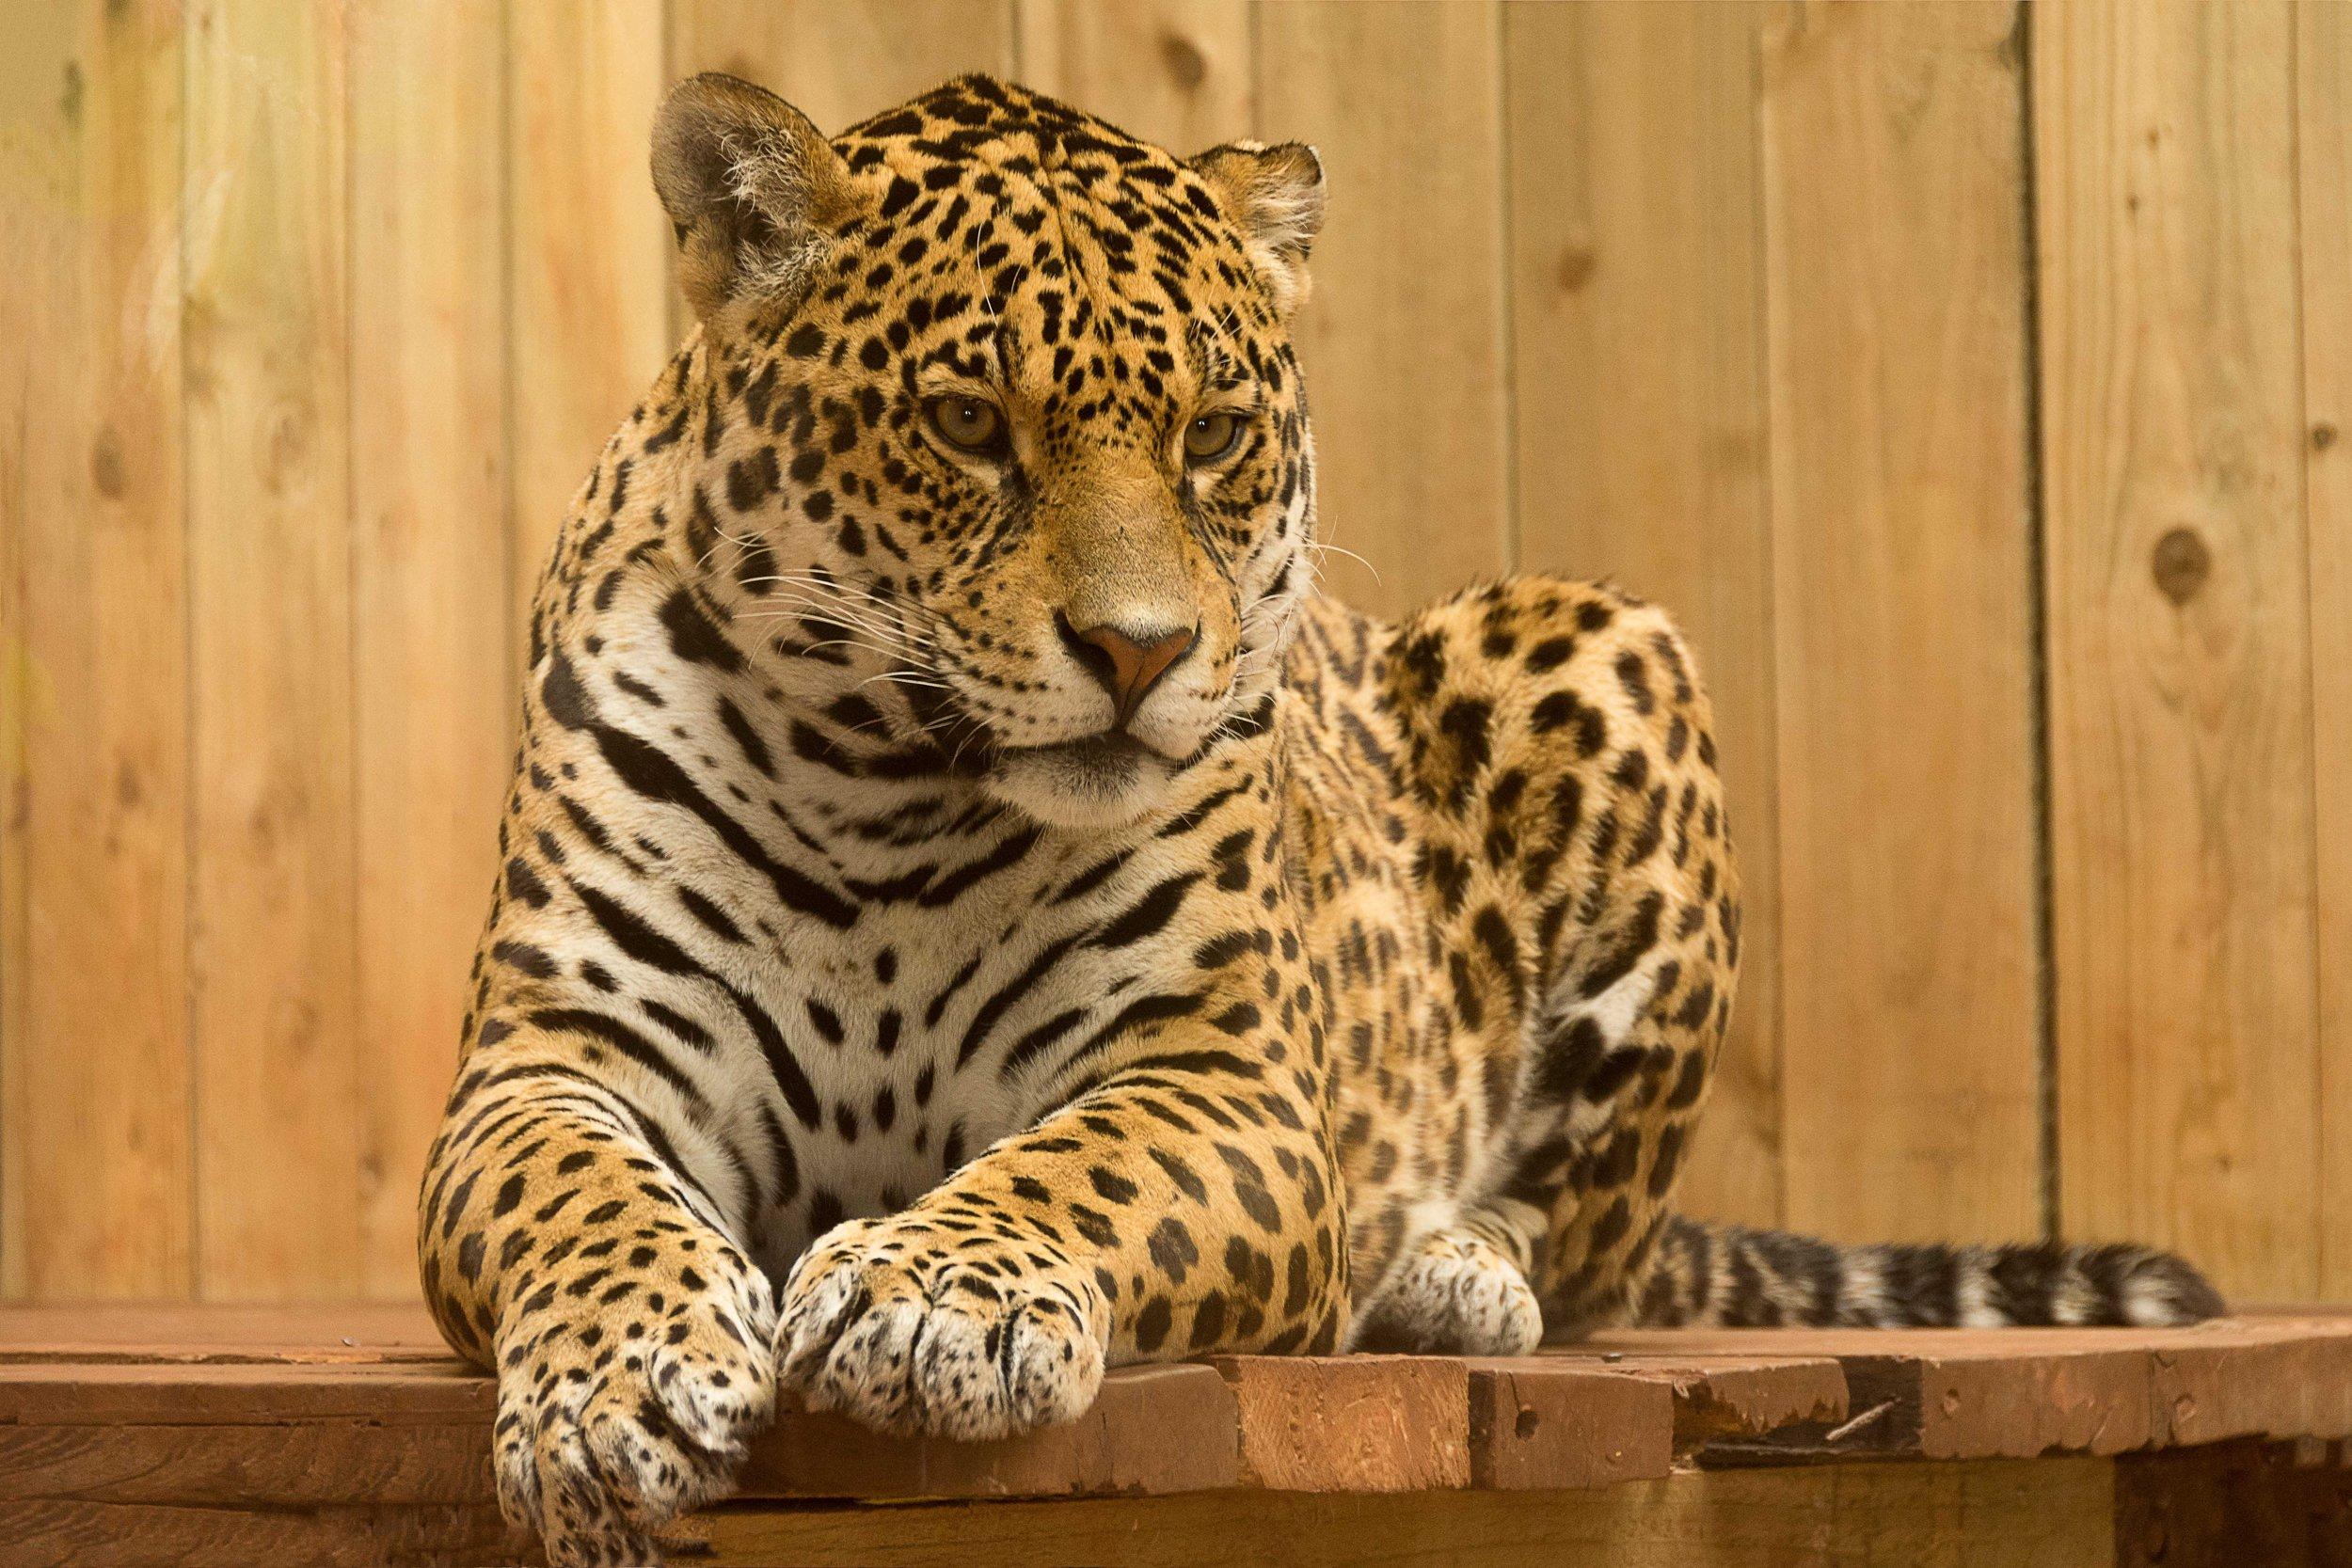 nature-animal-wildlife-zoo-cat-feline-1026086-pxhere.com.jpg